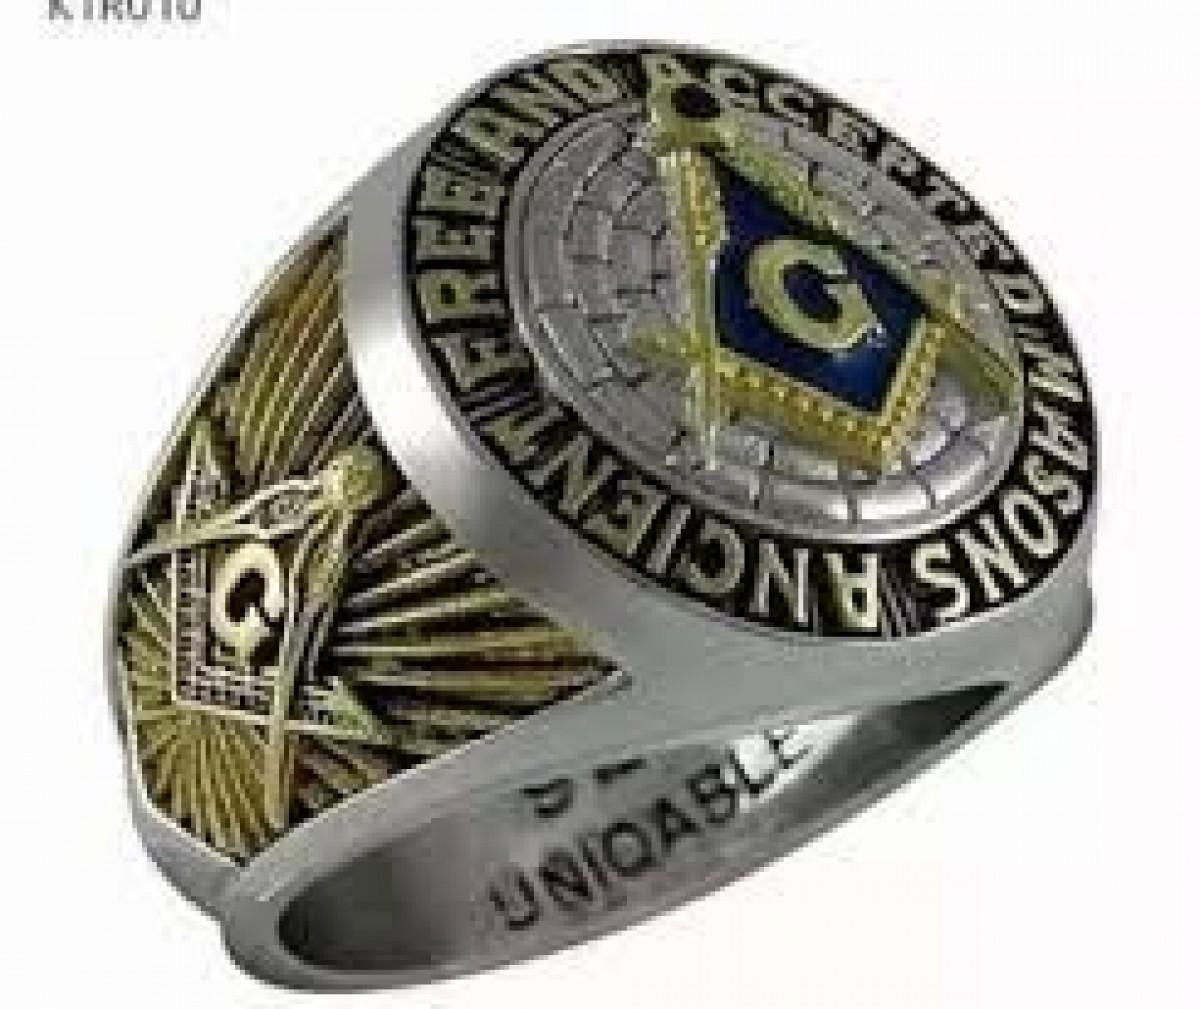 Magic ring, Wallet - Money Magnet Mantra ,27785149508